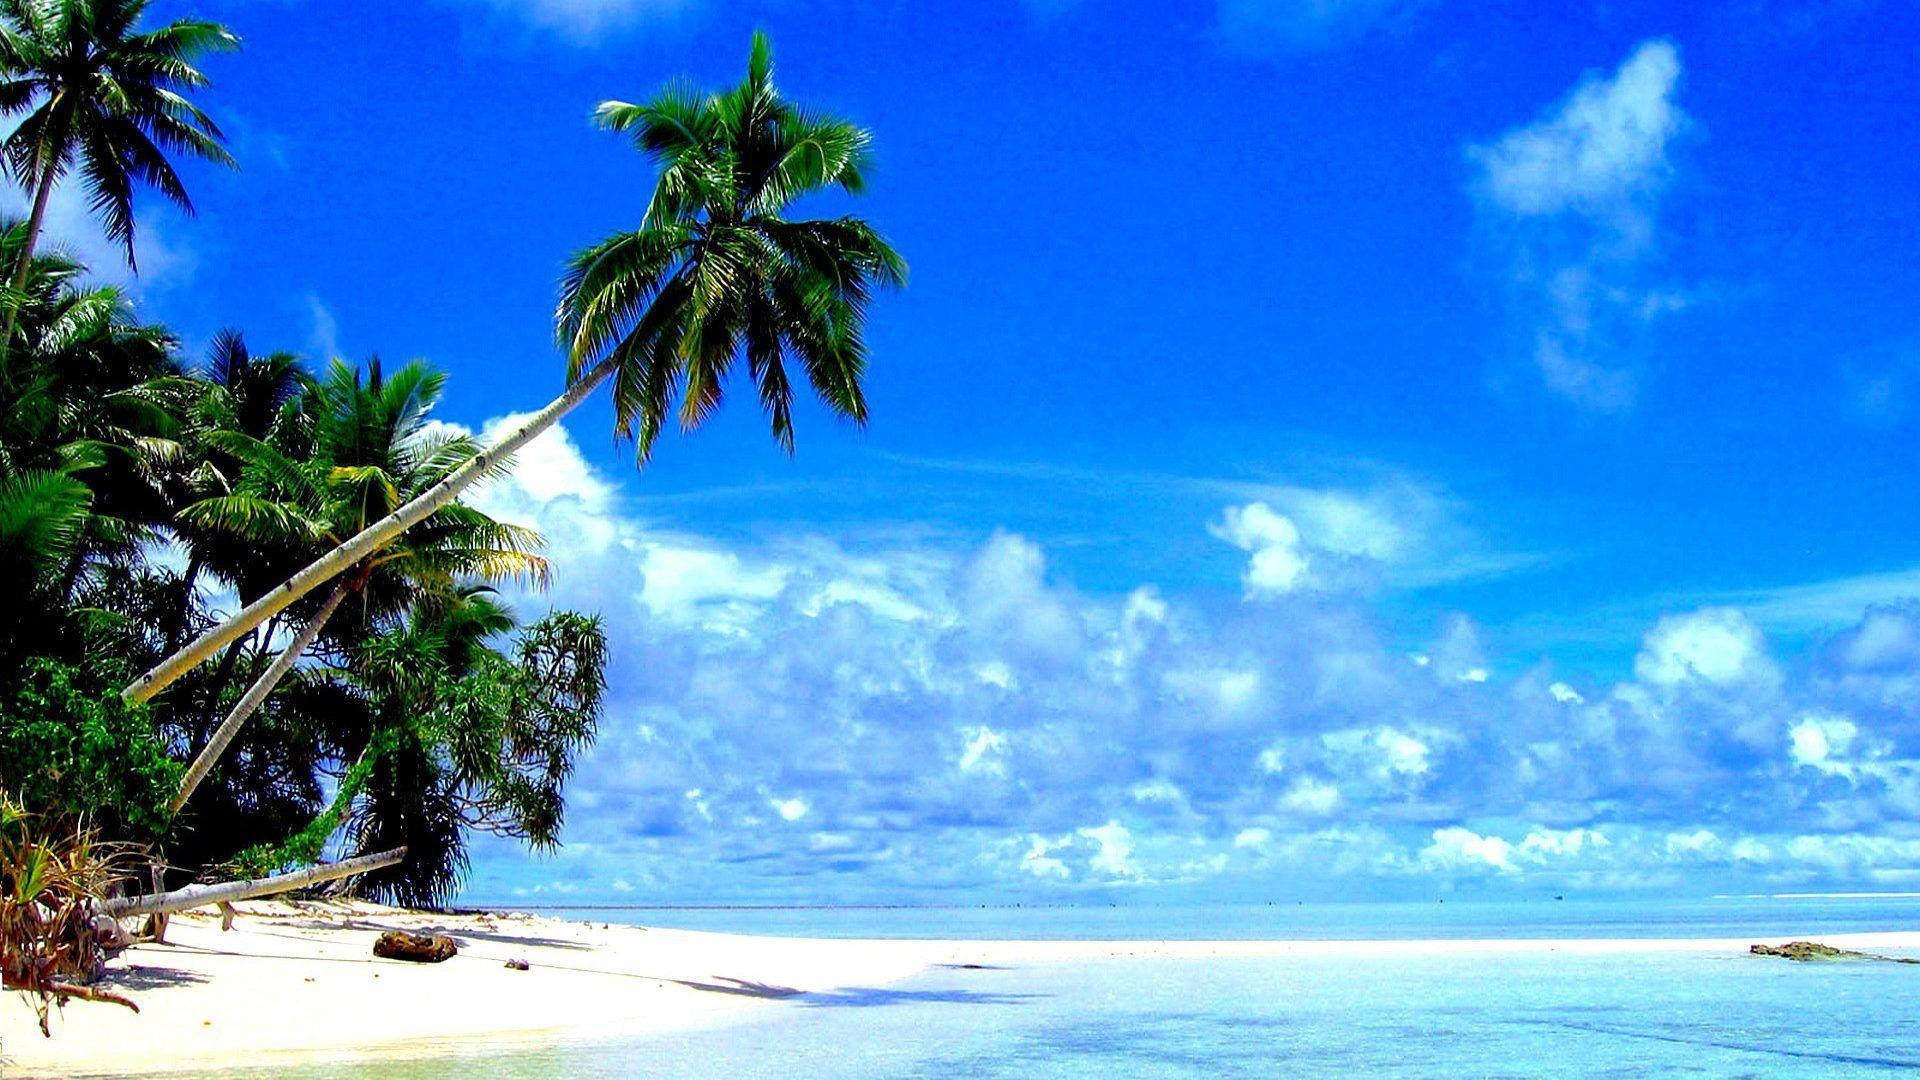 Tropical Island Beach Landscape Wallpaper: Tropical Beach Landscape Wallpapers